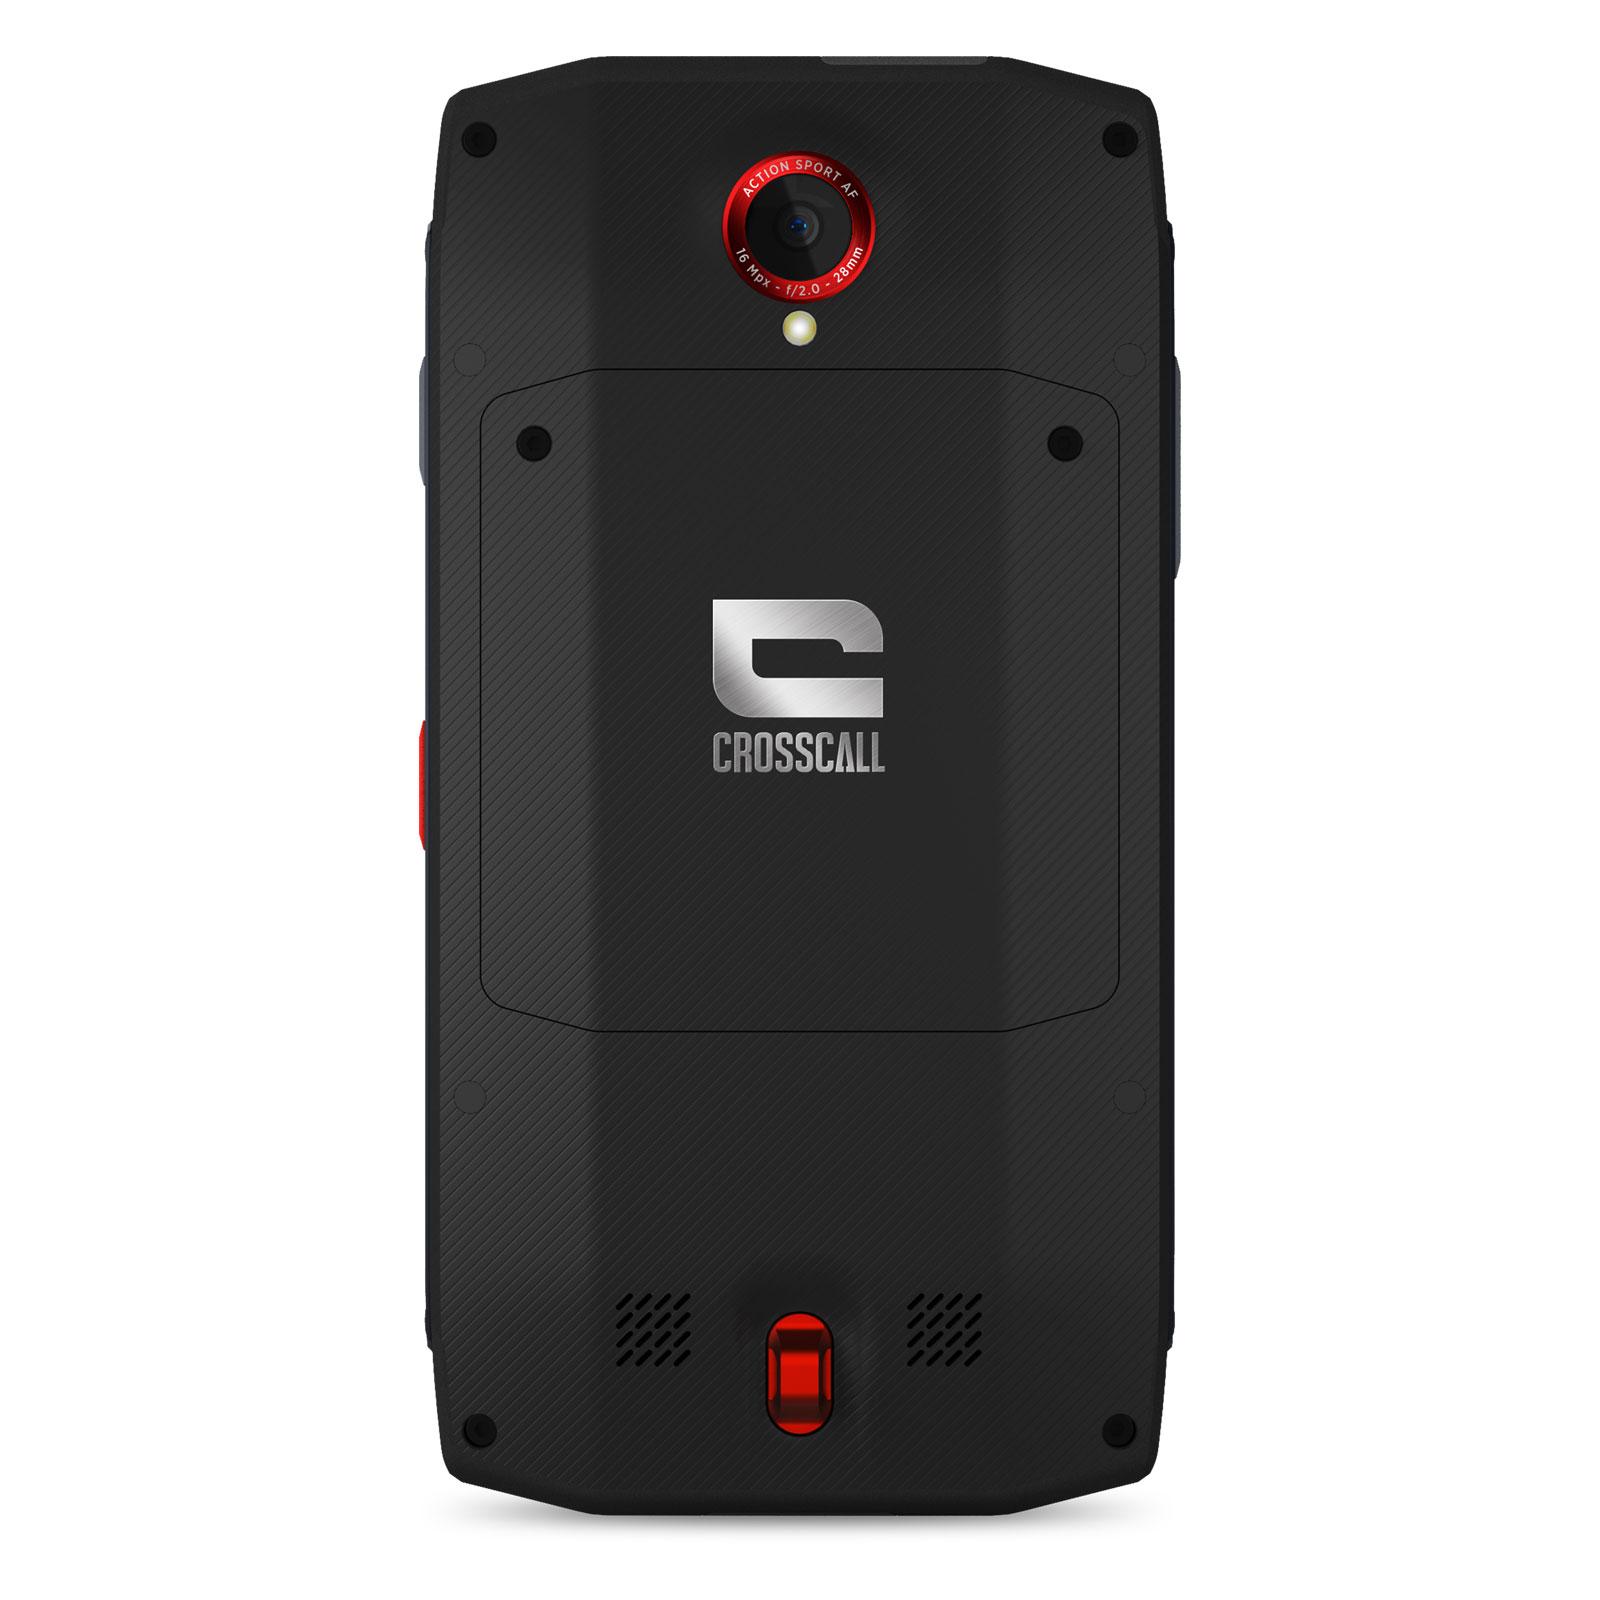 crosscall trekker x3 premium edition mobile smartphone. Black Bedroom Furniture Sets. Home Design Ideas